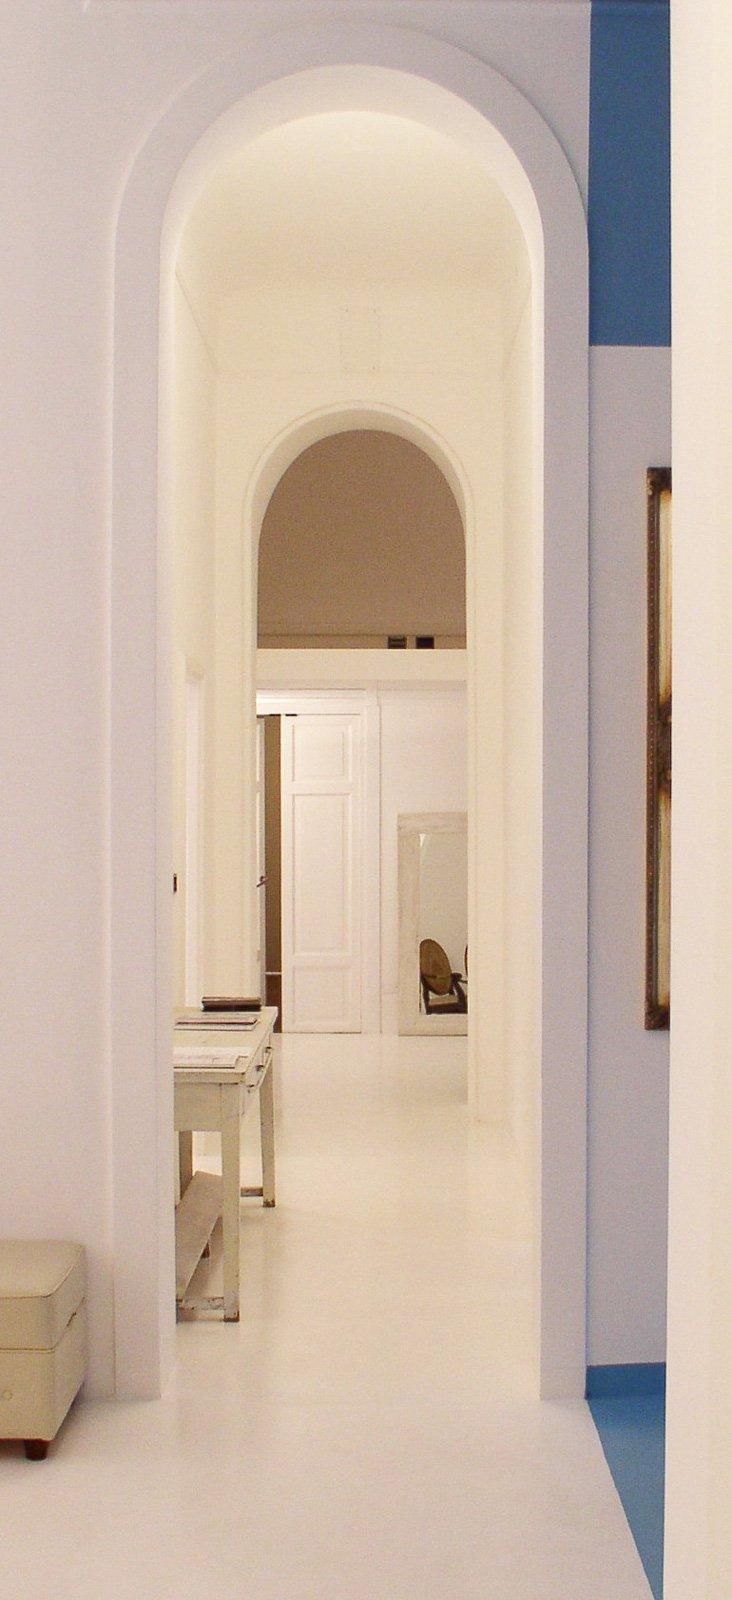 Chreon ingresso cose di casa - Ingresso di casa ...